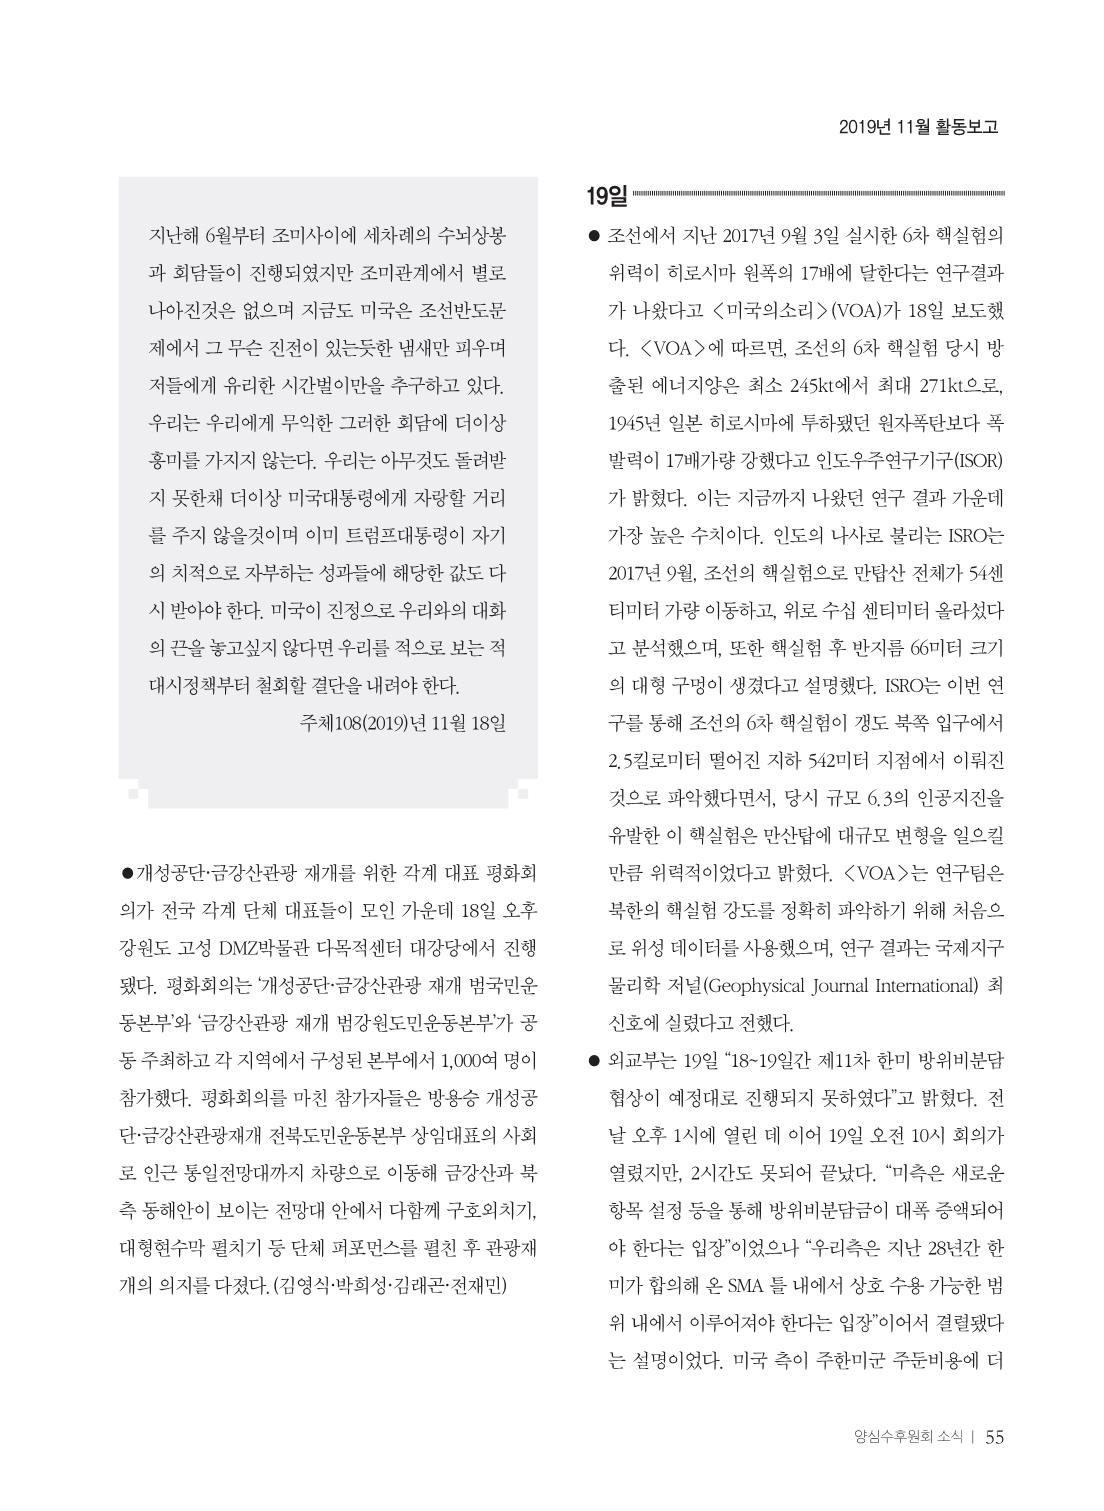 5802db1f-6a90-451c-ac2e-da2a23bee939.pdf-0057.jpg